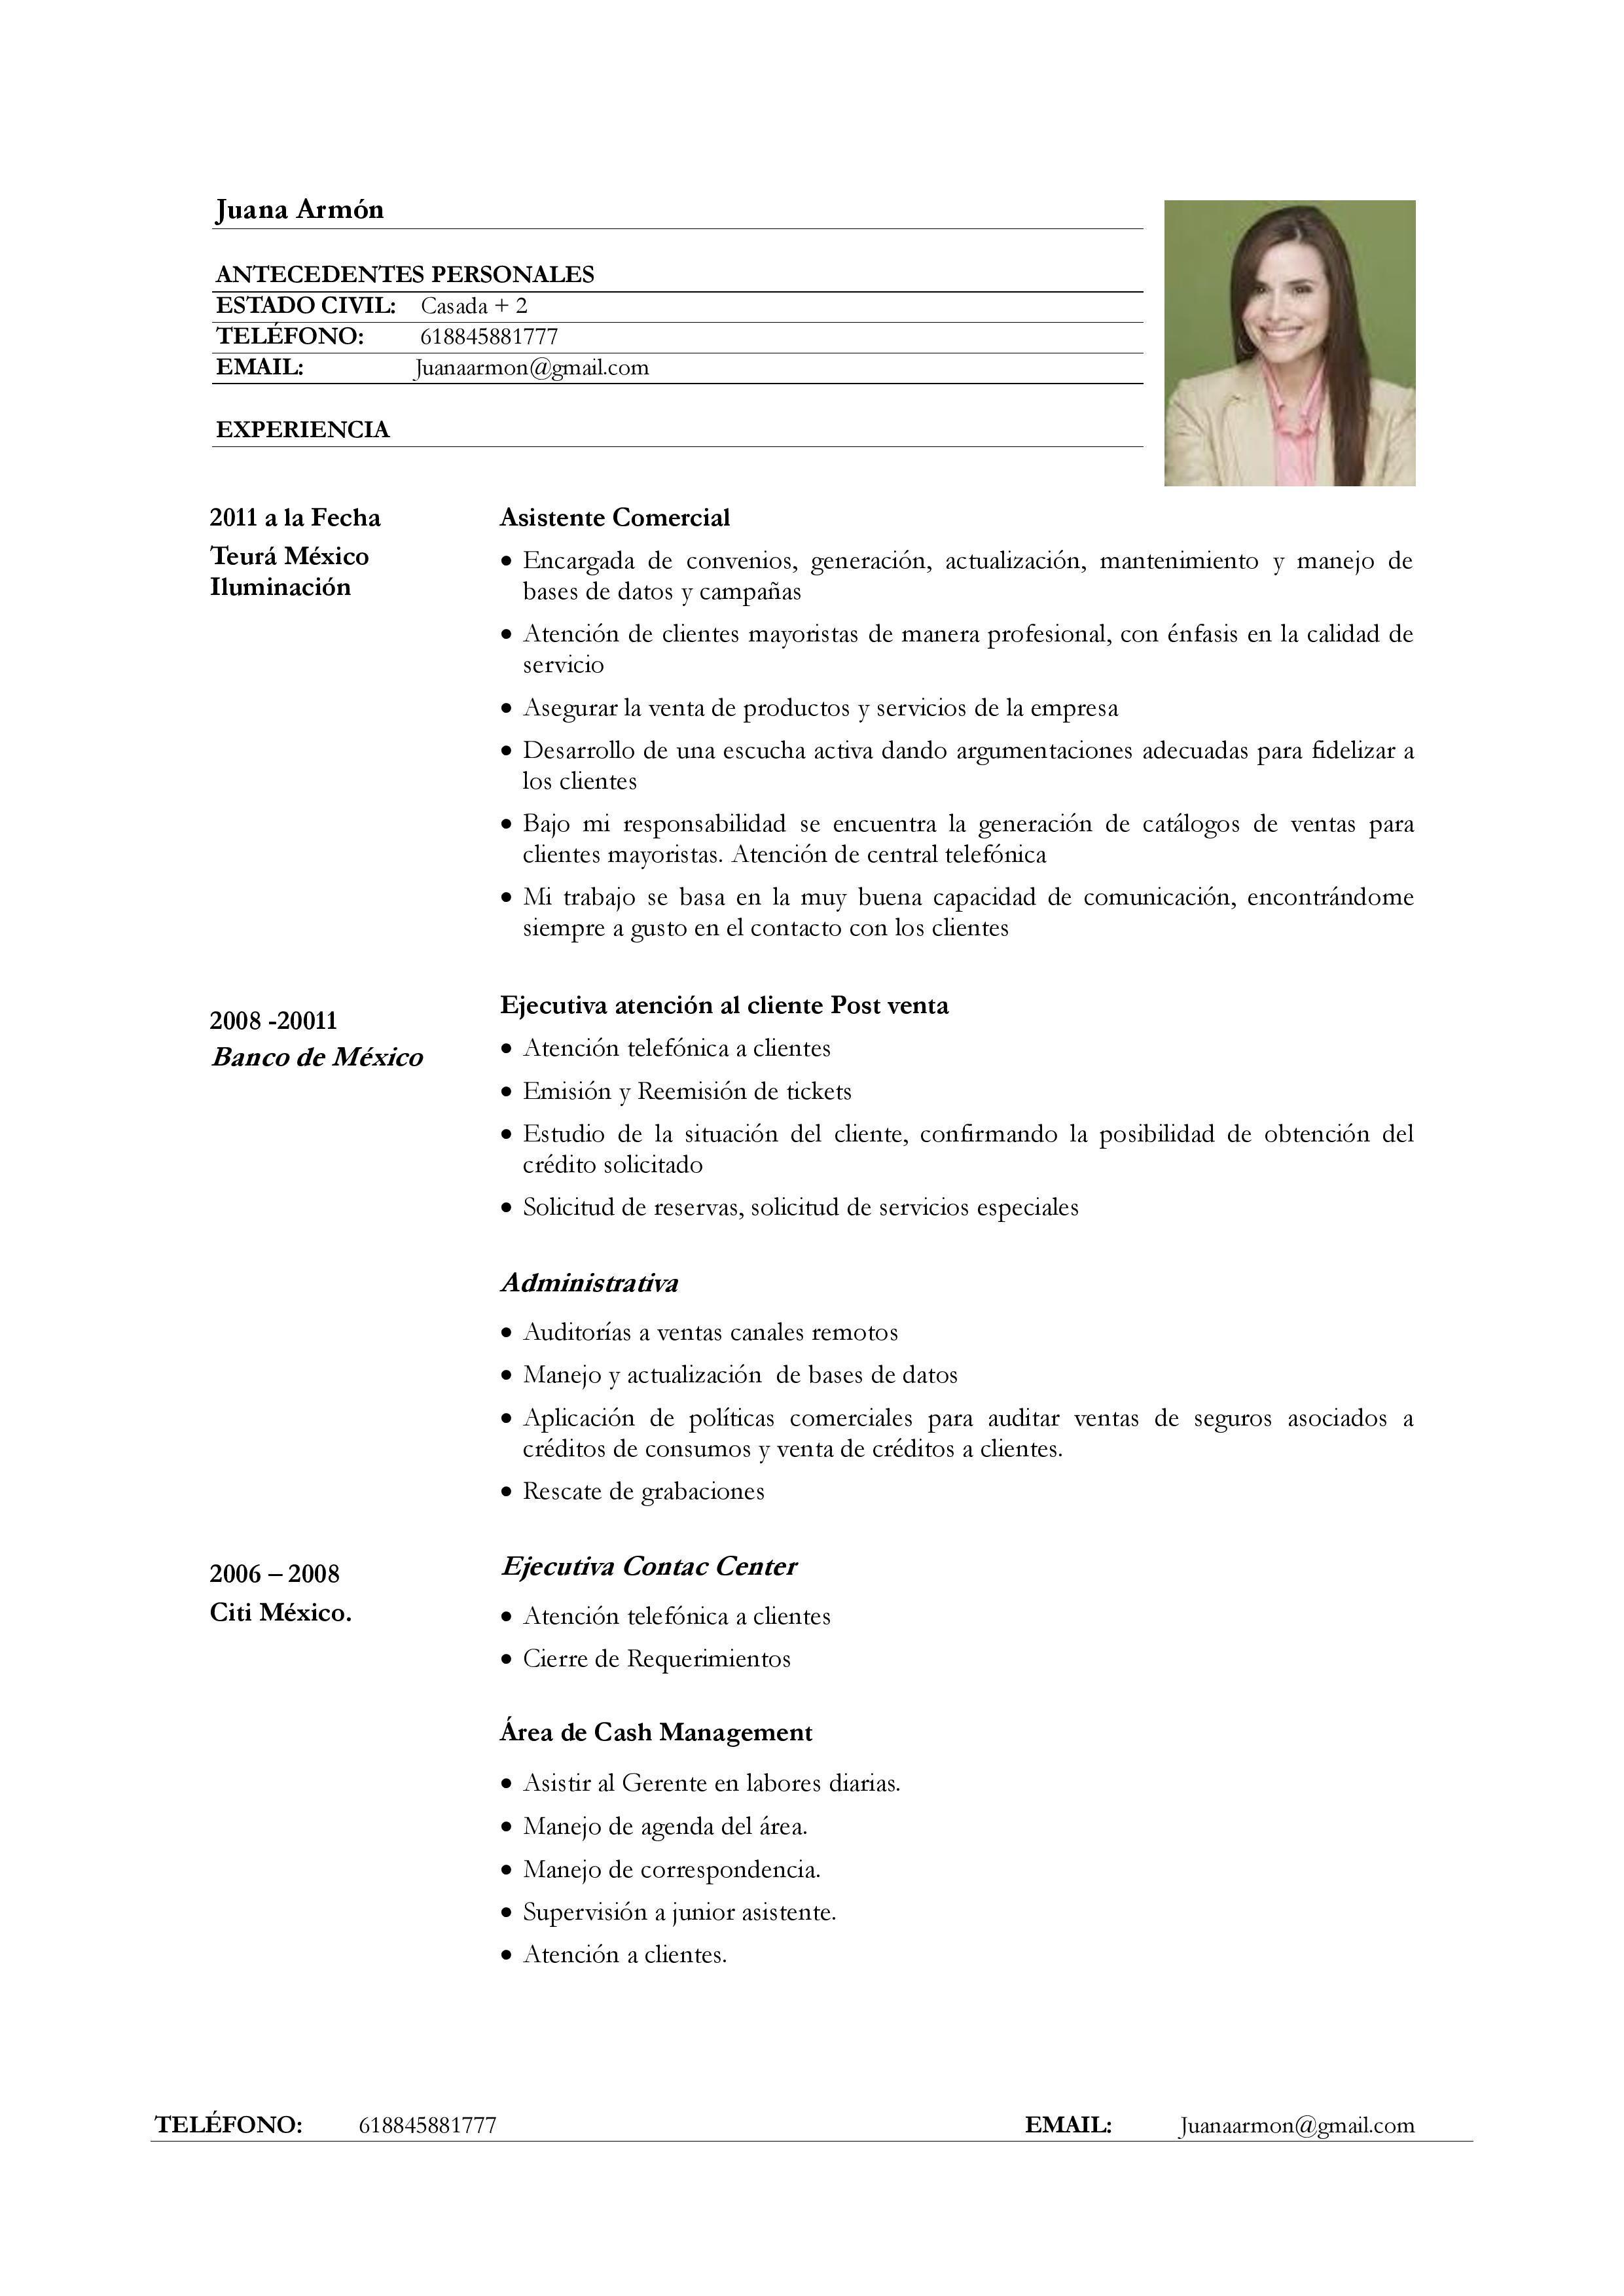 Dorable Hacer Un Currículum Vitae Gratis Imagen - Ejemplo De ...